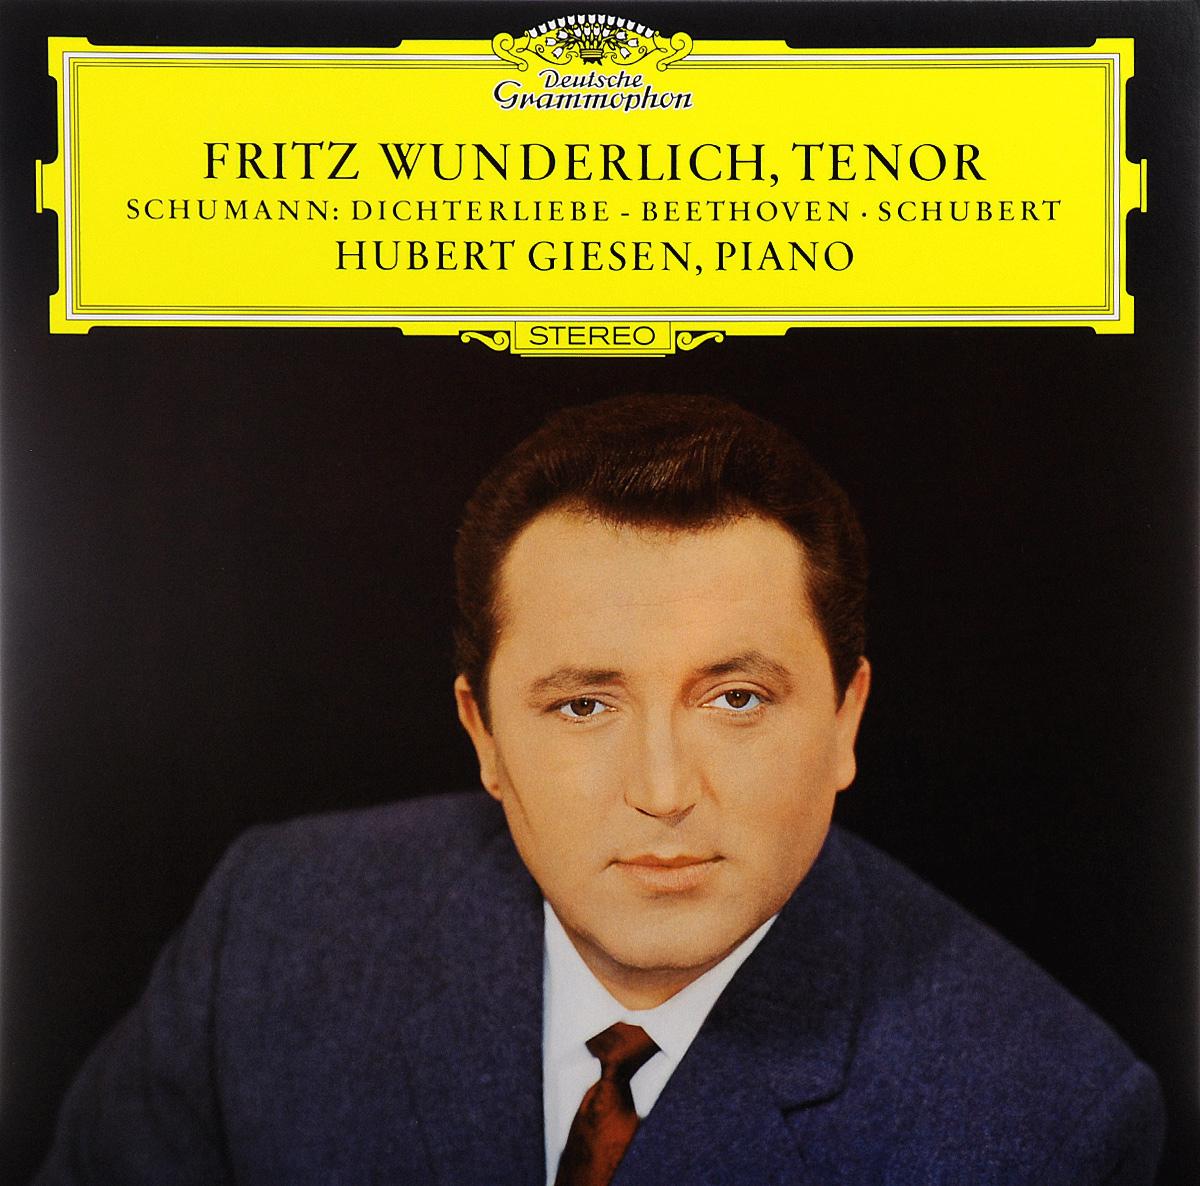 цена на Фритц Вундерлих,Хуберт Гисен Fritz Wunderlich. Hubert Giesen. Schumann / Beethoven / Schubert (LP)